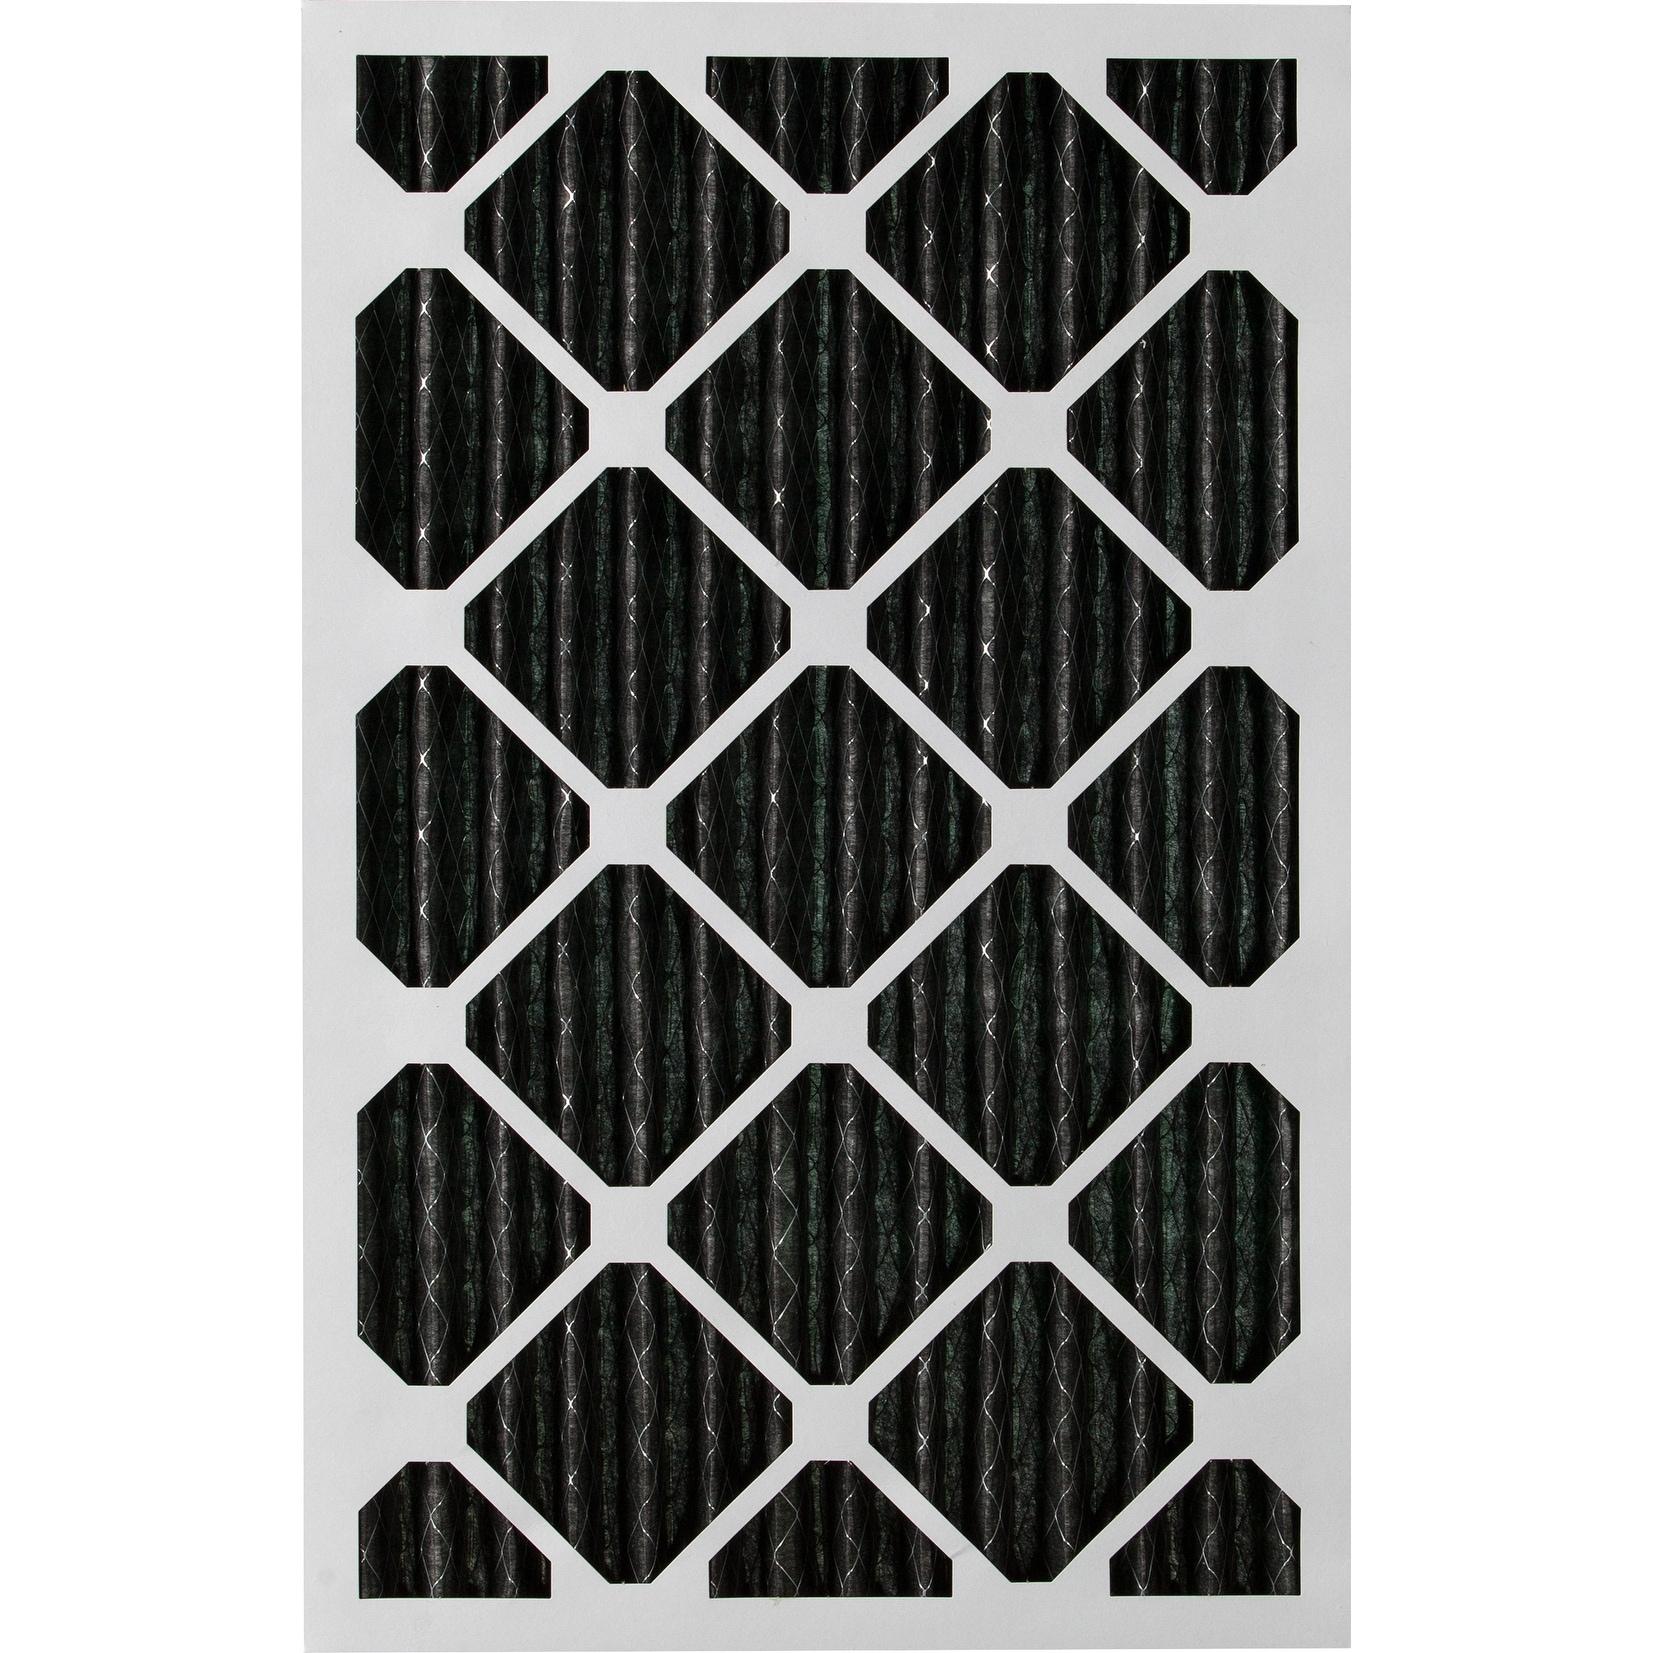 Nordic Pure 16/_1//4x21/_1//4x1 Exact MERV 12 Tru Mini Pleat AC Furnace Air Filters 1 Pack